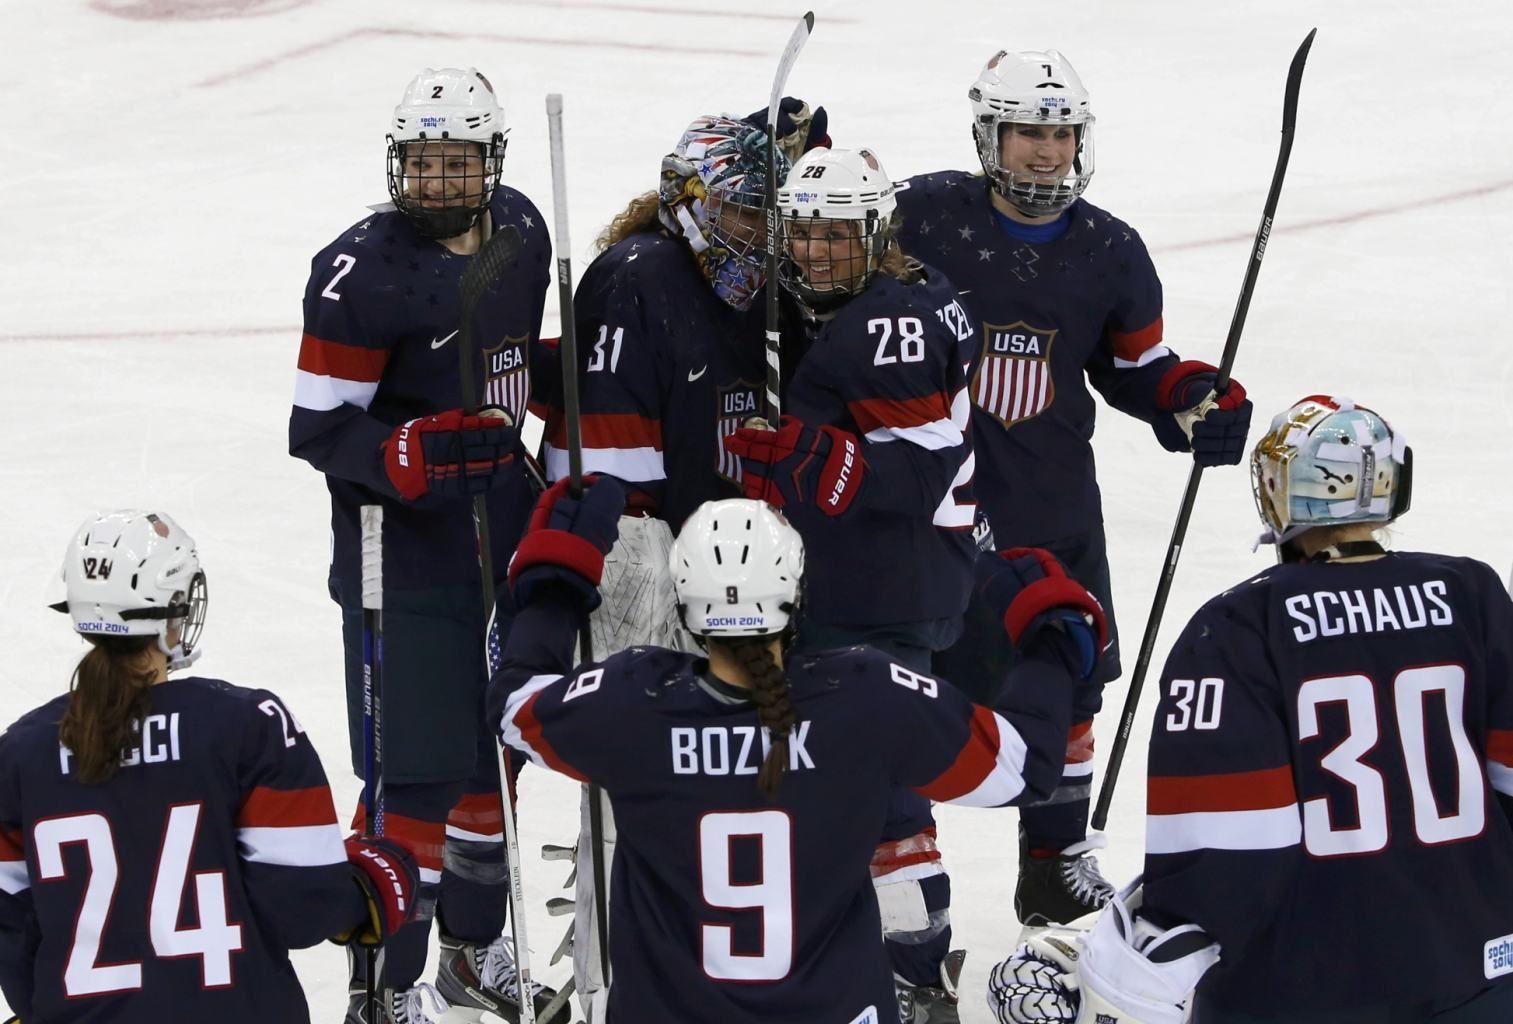 Sochi2014 Ice Hockey Women S Play Offs Semifinals Usa 6 Sweden 1 The United States Beat Sweden 6 1 On Mo Usa Hockey Winter Olympics Hockey Playoffs